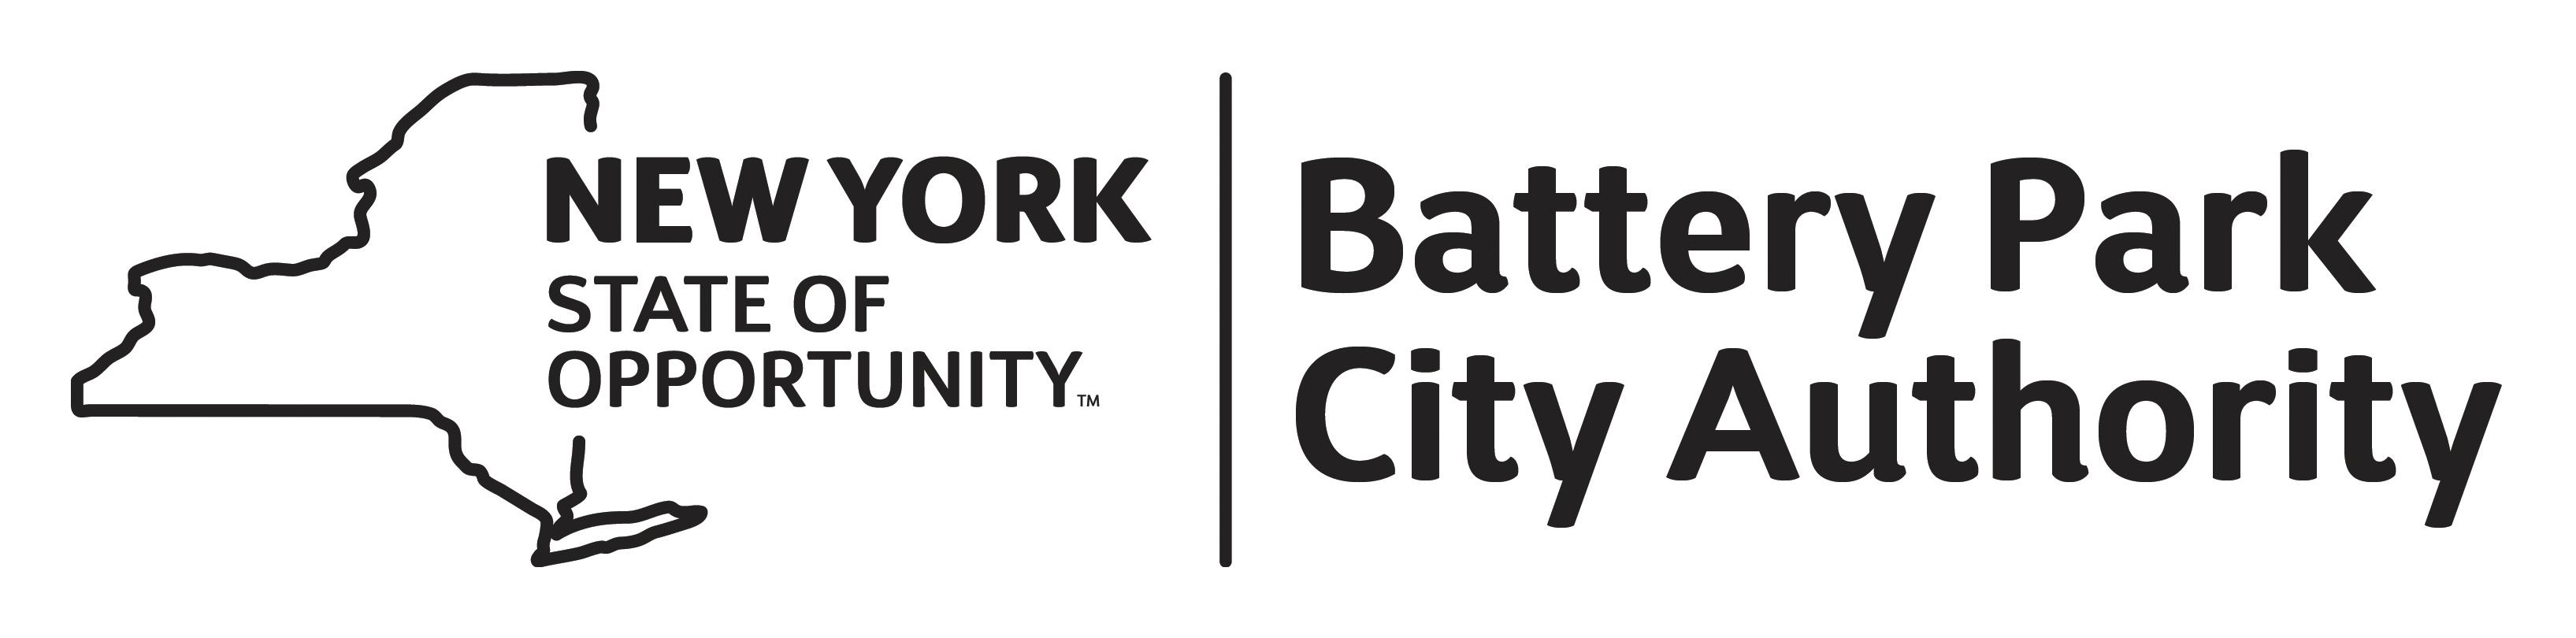 Battery Park City Authority Events